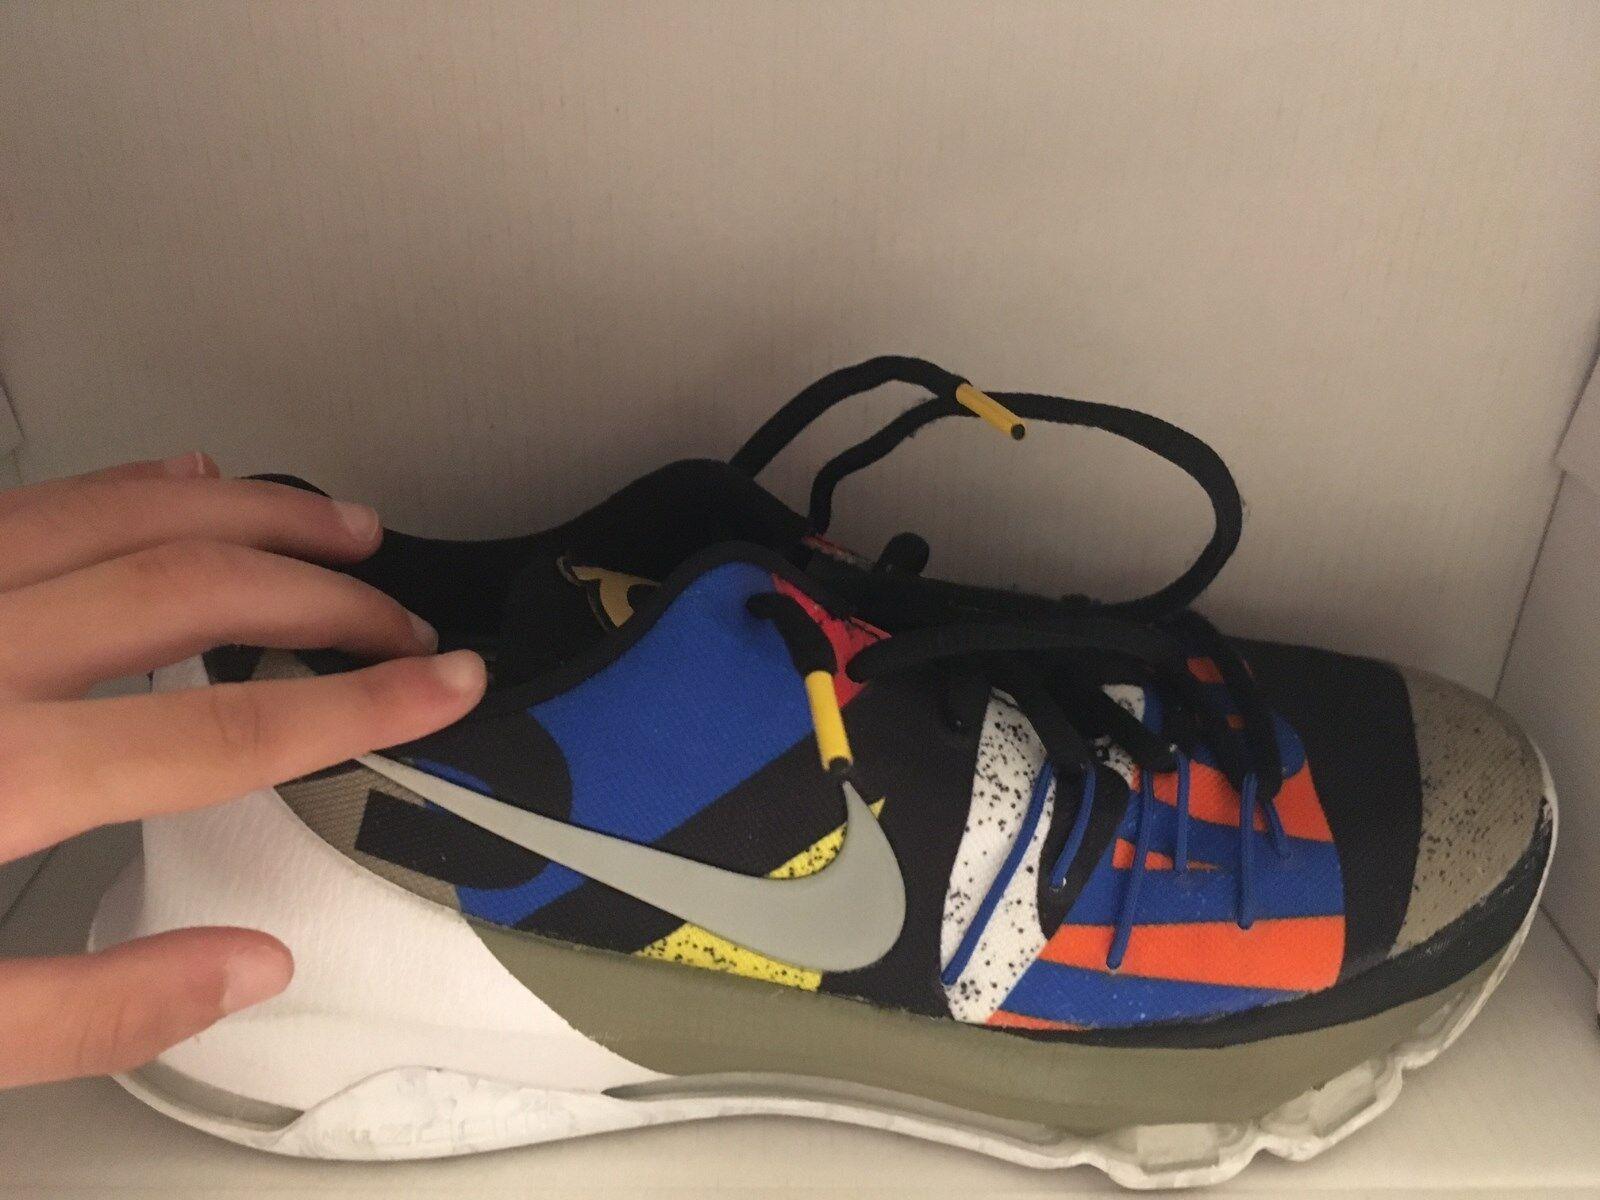 Kd viii partita all - - - star basket scarpe da ginnastica - 38 5cbc7e